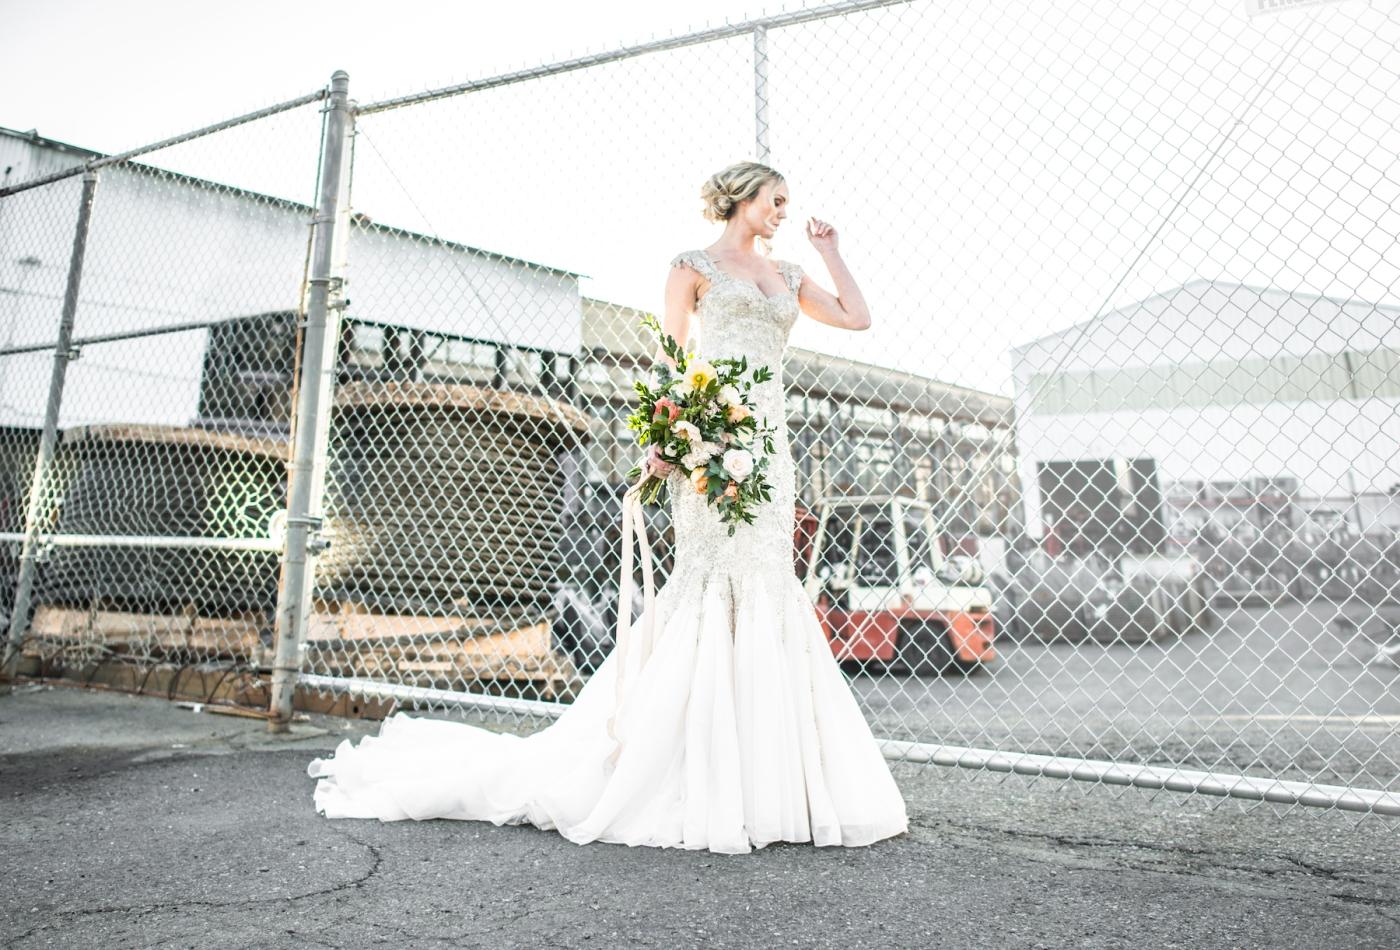 photography_by_jane_speleers_2017_wedding_show_i_do_sodo_within_designed_by_melody_davisdsc_0703